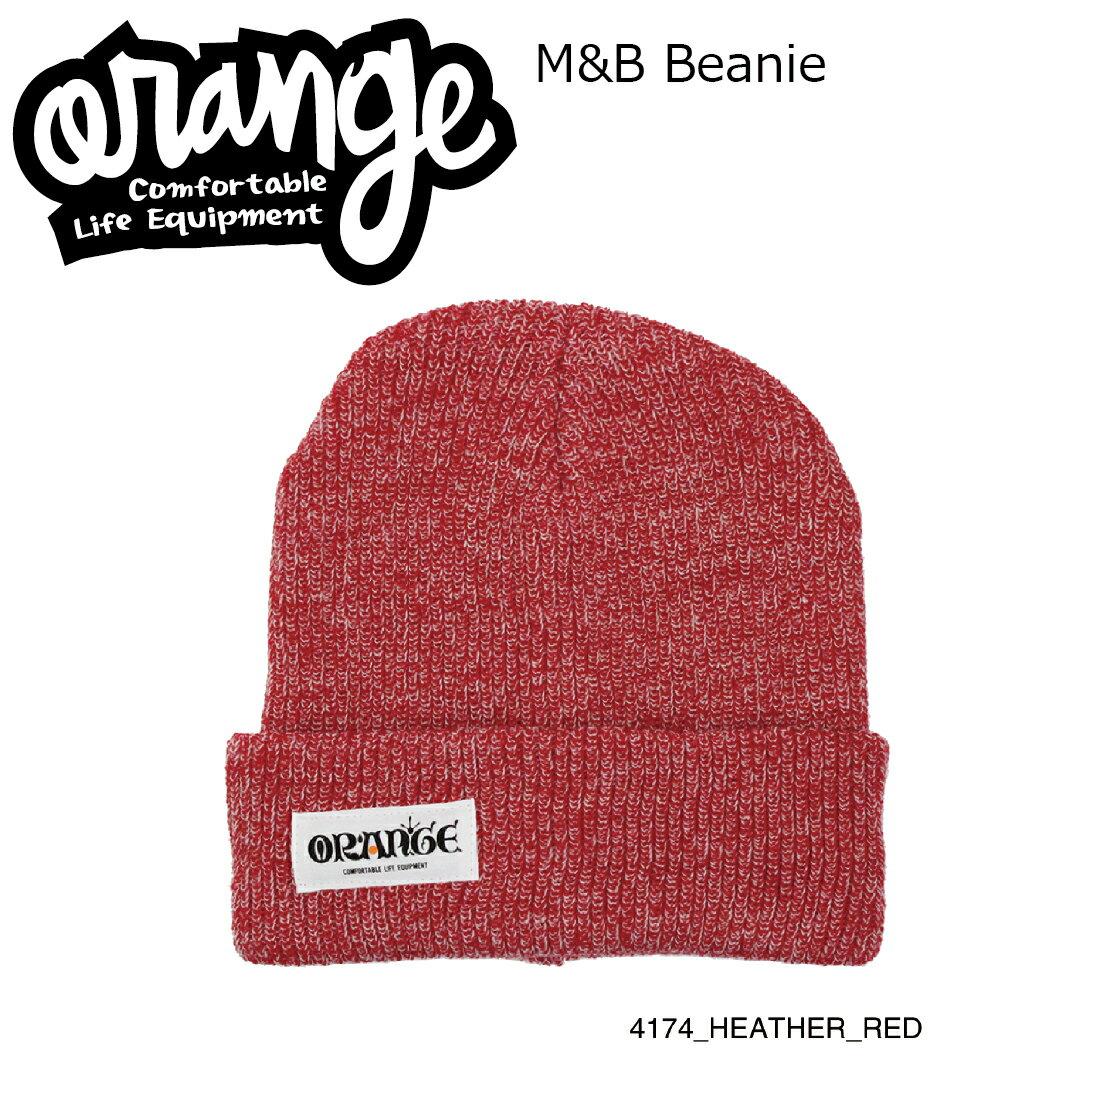 Oran'ge M&B Beanie 4174 HEATHER RED オレンジ エムアンドビー ビーニー ニットキャップ 2つ折り